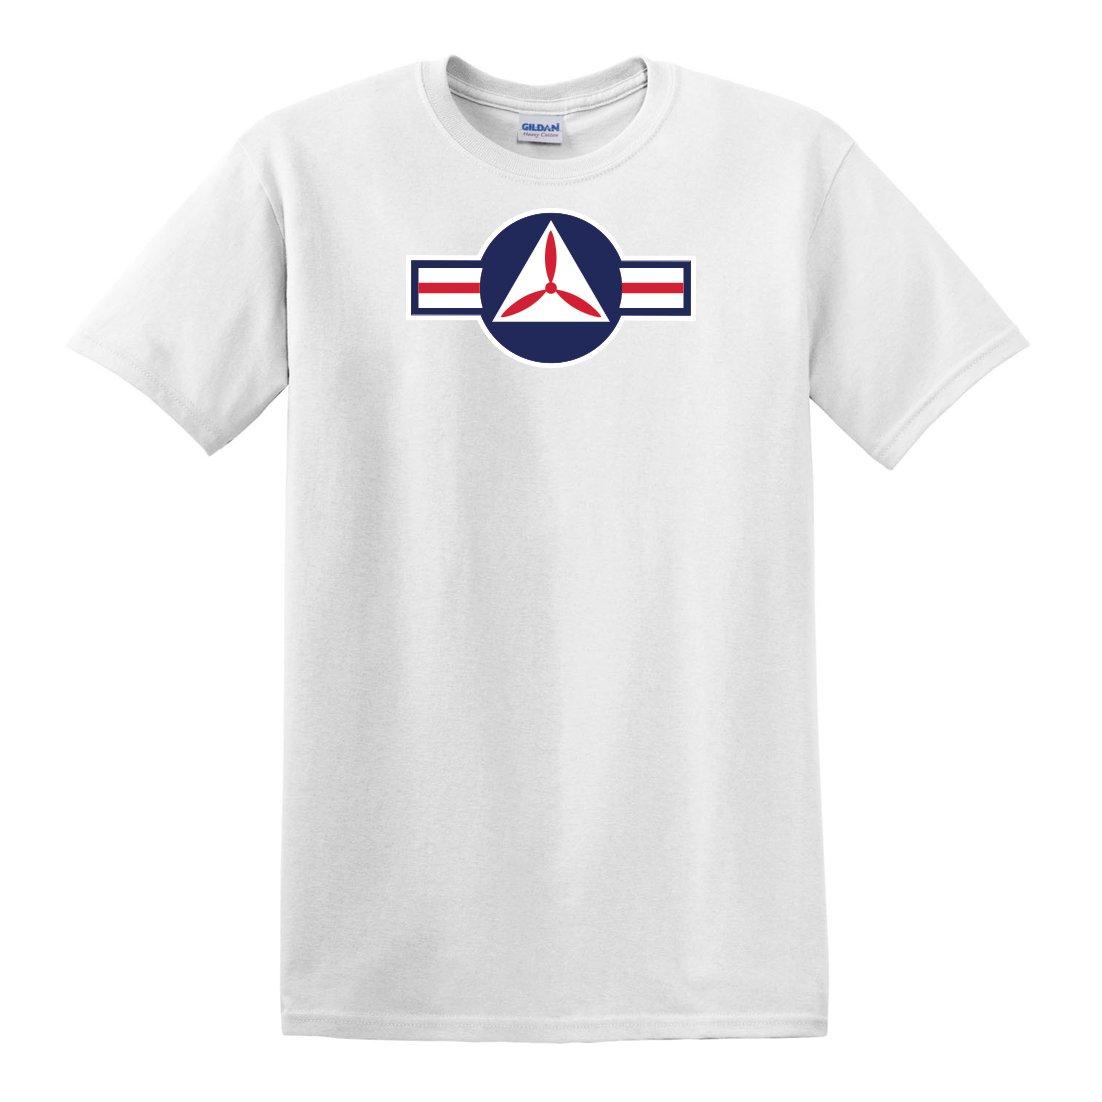 11121418a Amazon.com: fagraphix Men's United States Air Force USAF Civil Air Patrol Roundel  T-Shirt: Clothing